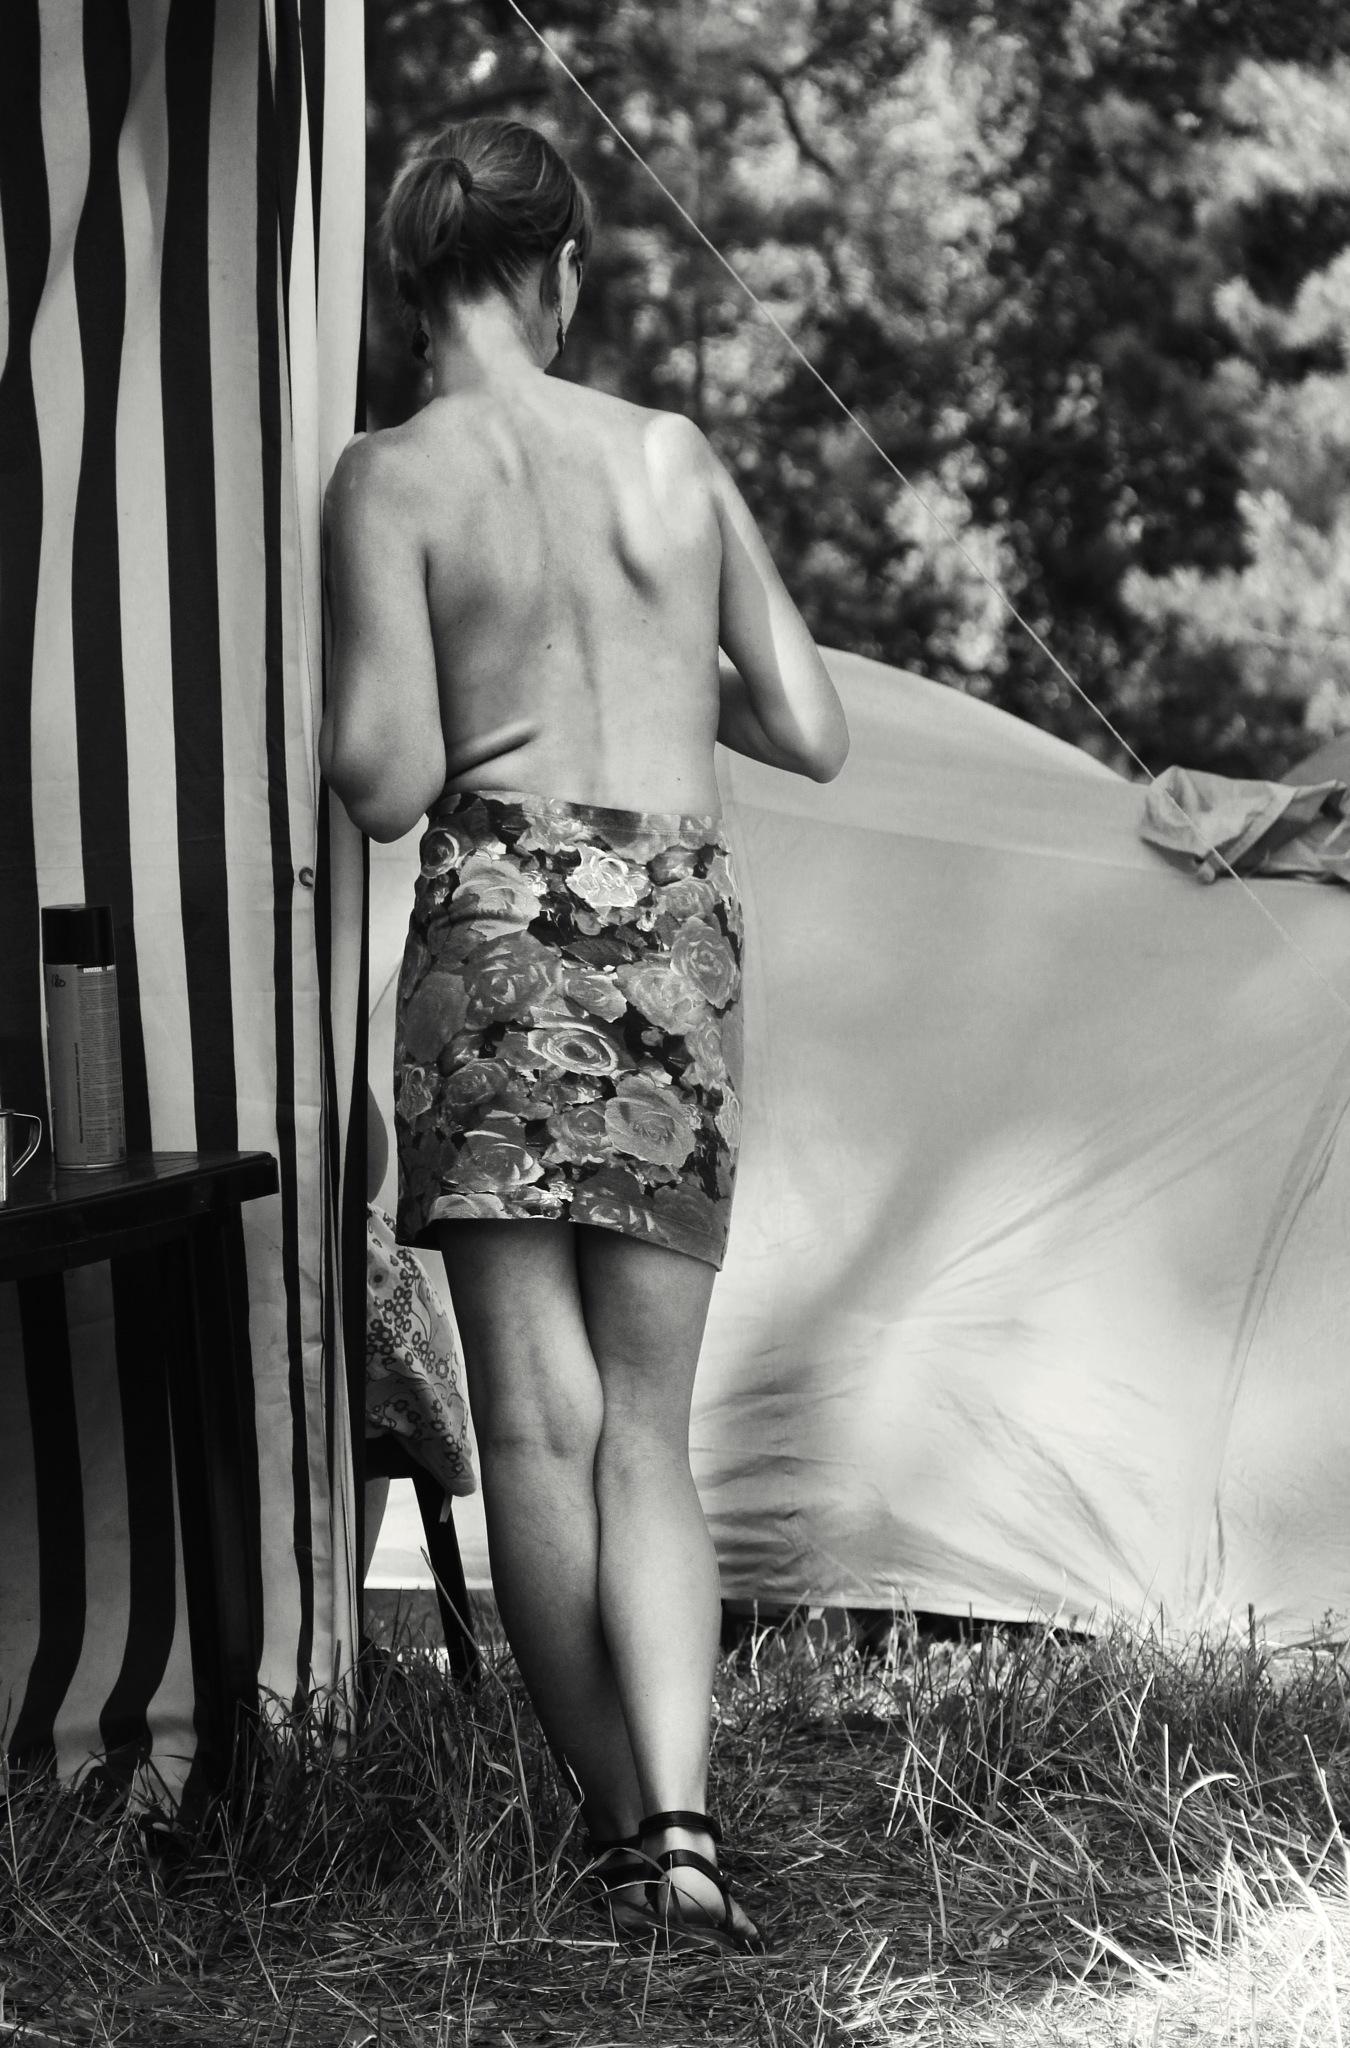 Woman in the shade by Сергей Юрьев